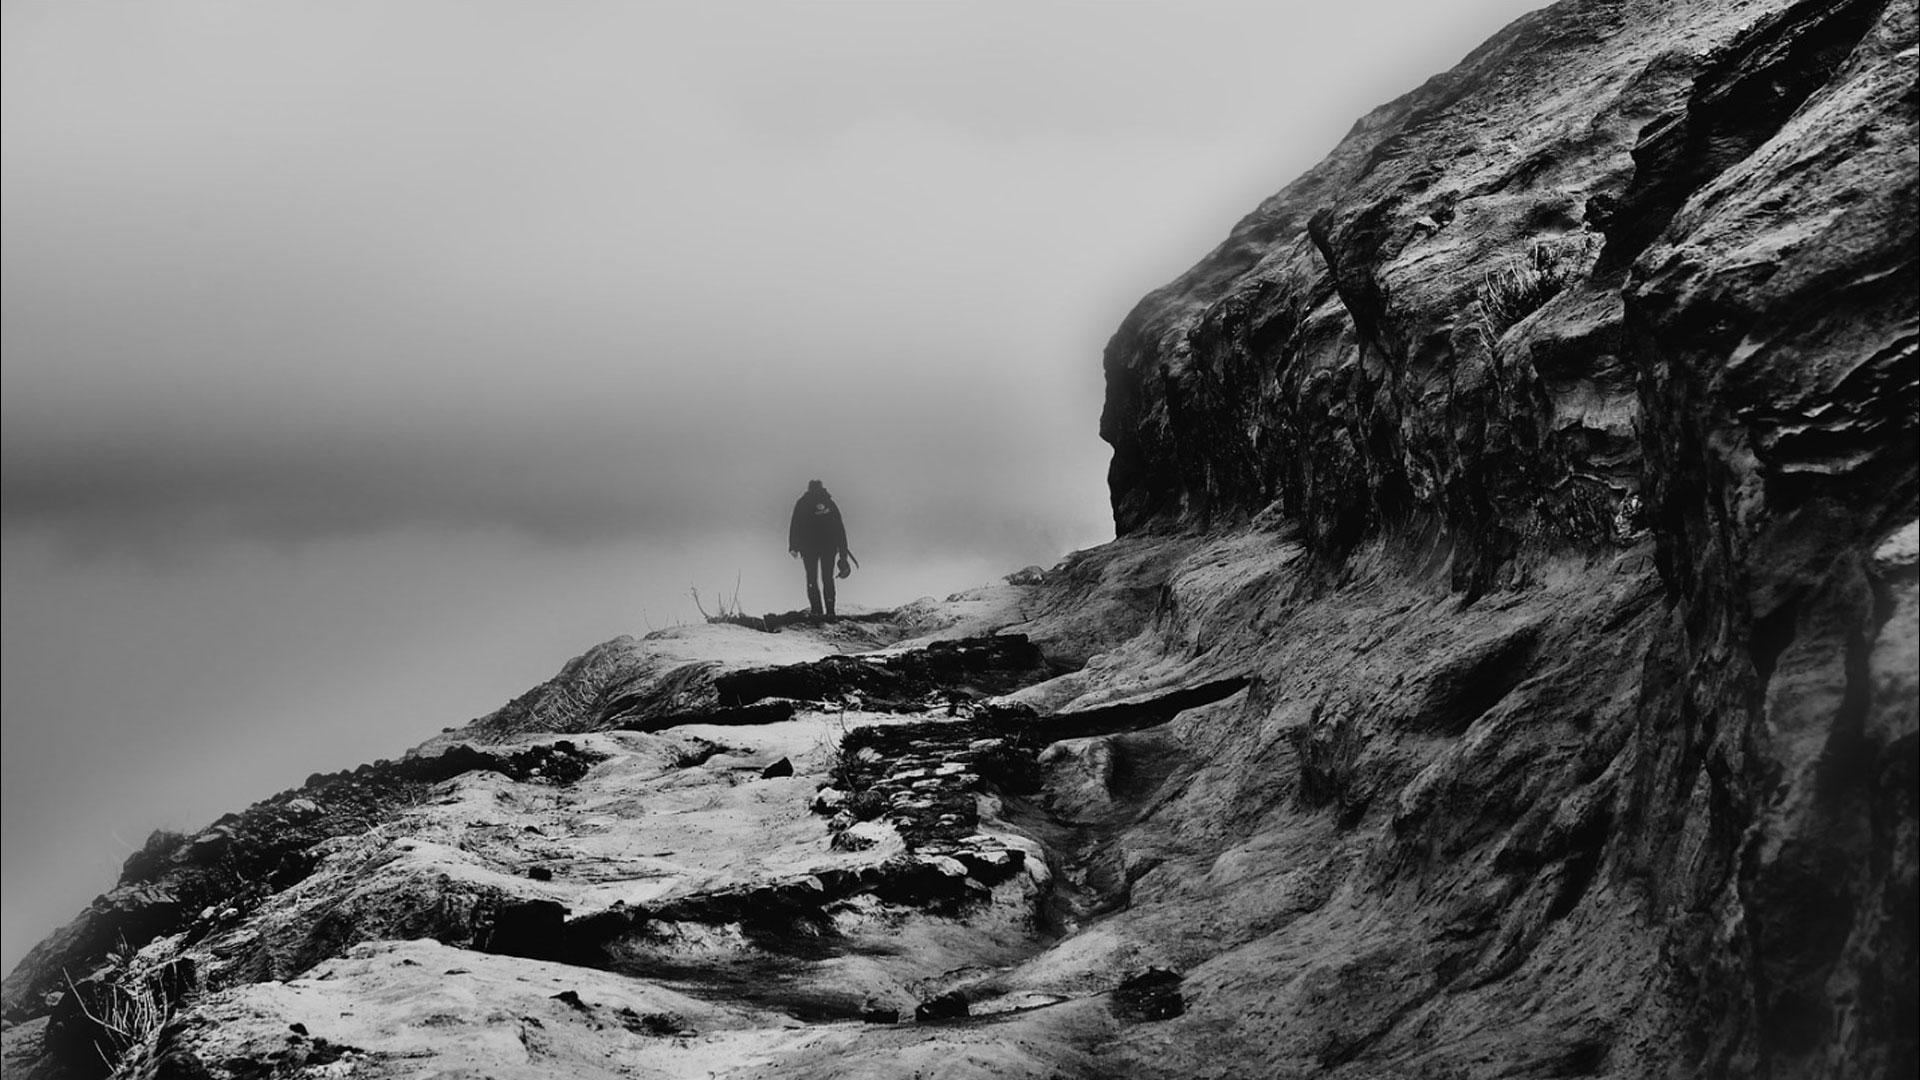 Photographer of the Day: Edouard Ketterer